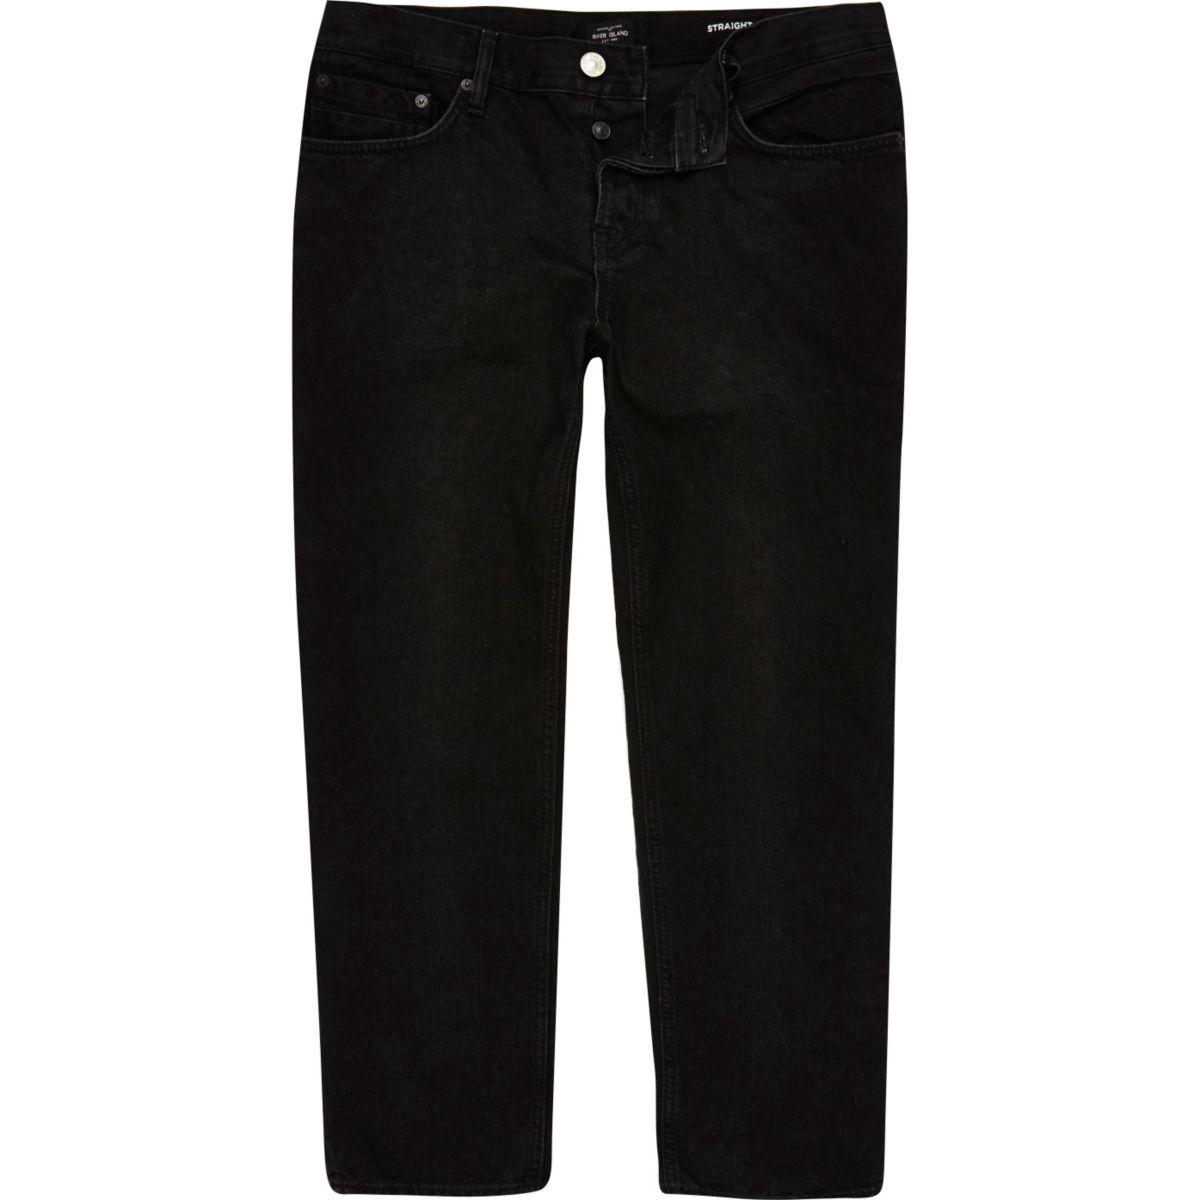 Dean – Schwarze, knöchellange Straight Jeans